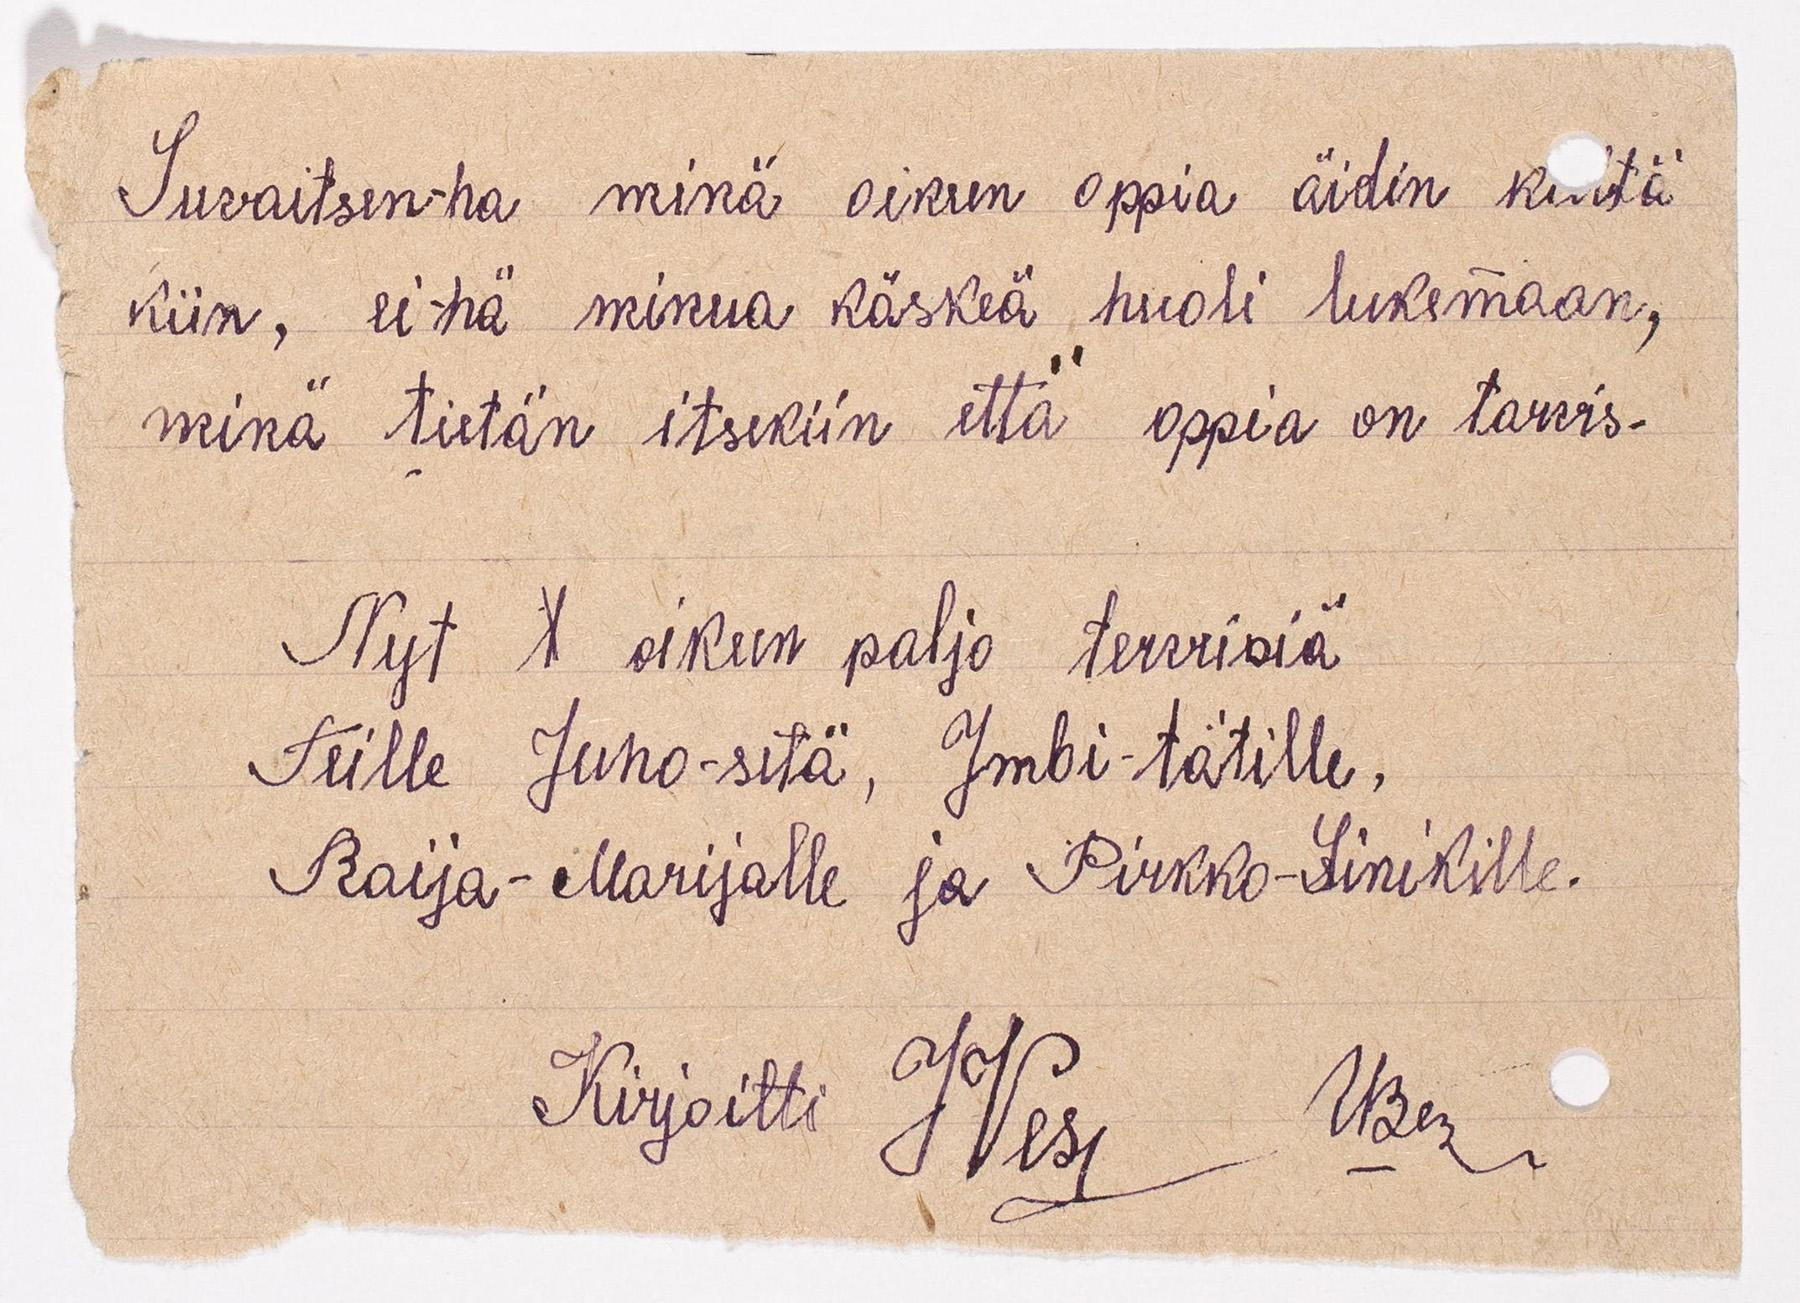 Juho Juhananpoika Vesan kirje sedälleen Juho Teponpoika Vesalle. SKS KIA, Juho Vesan arkisto. CC BY 4.0